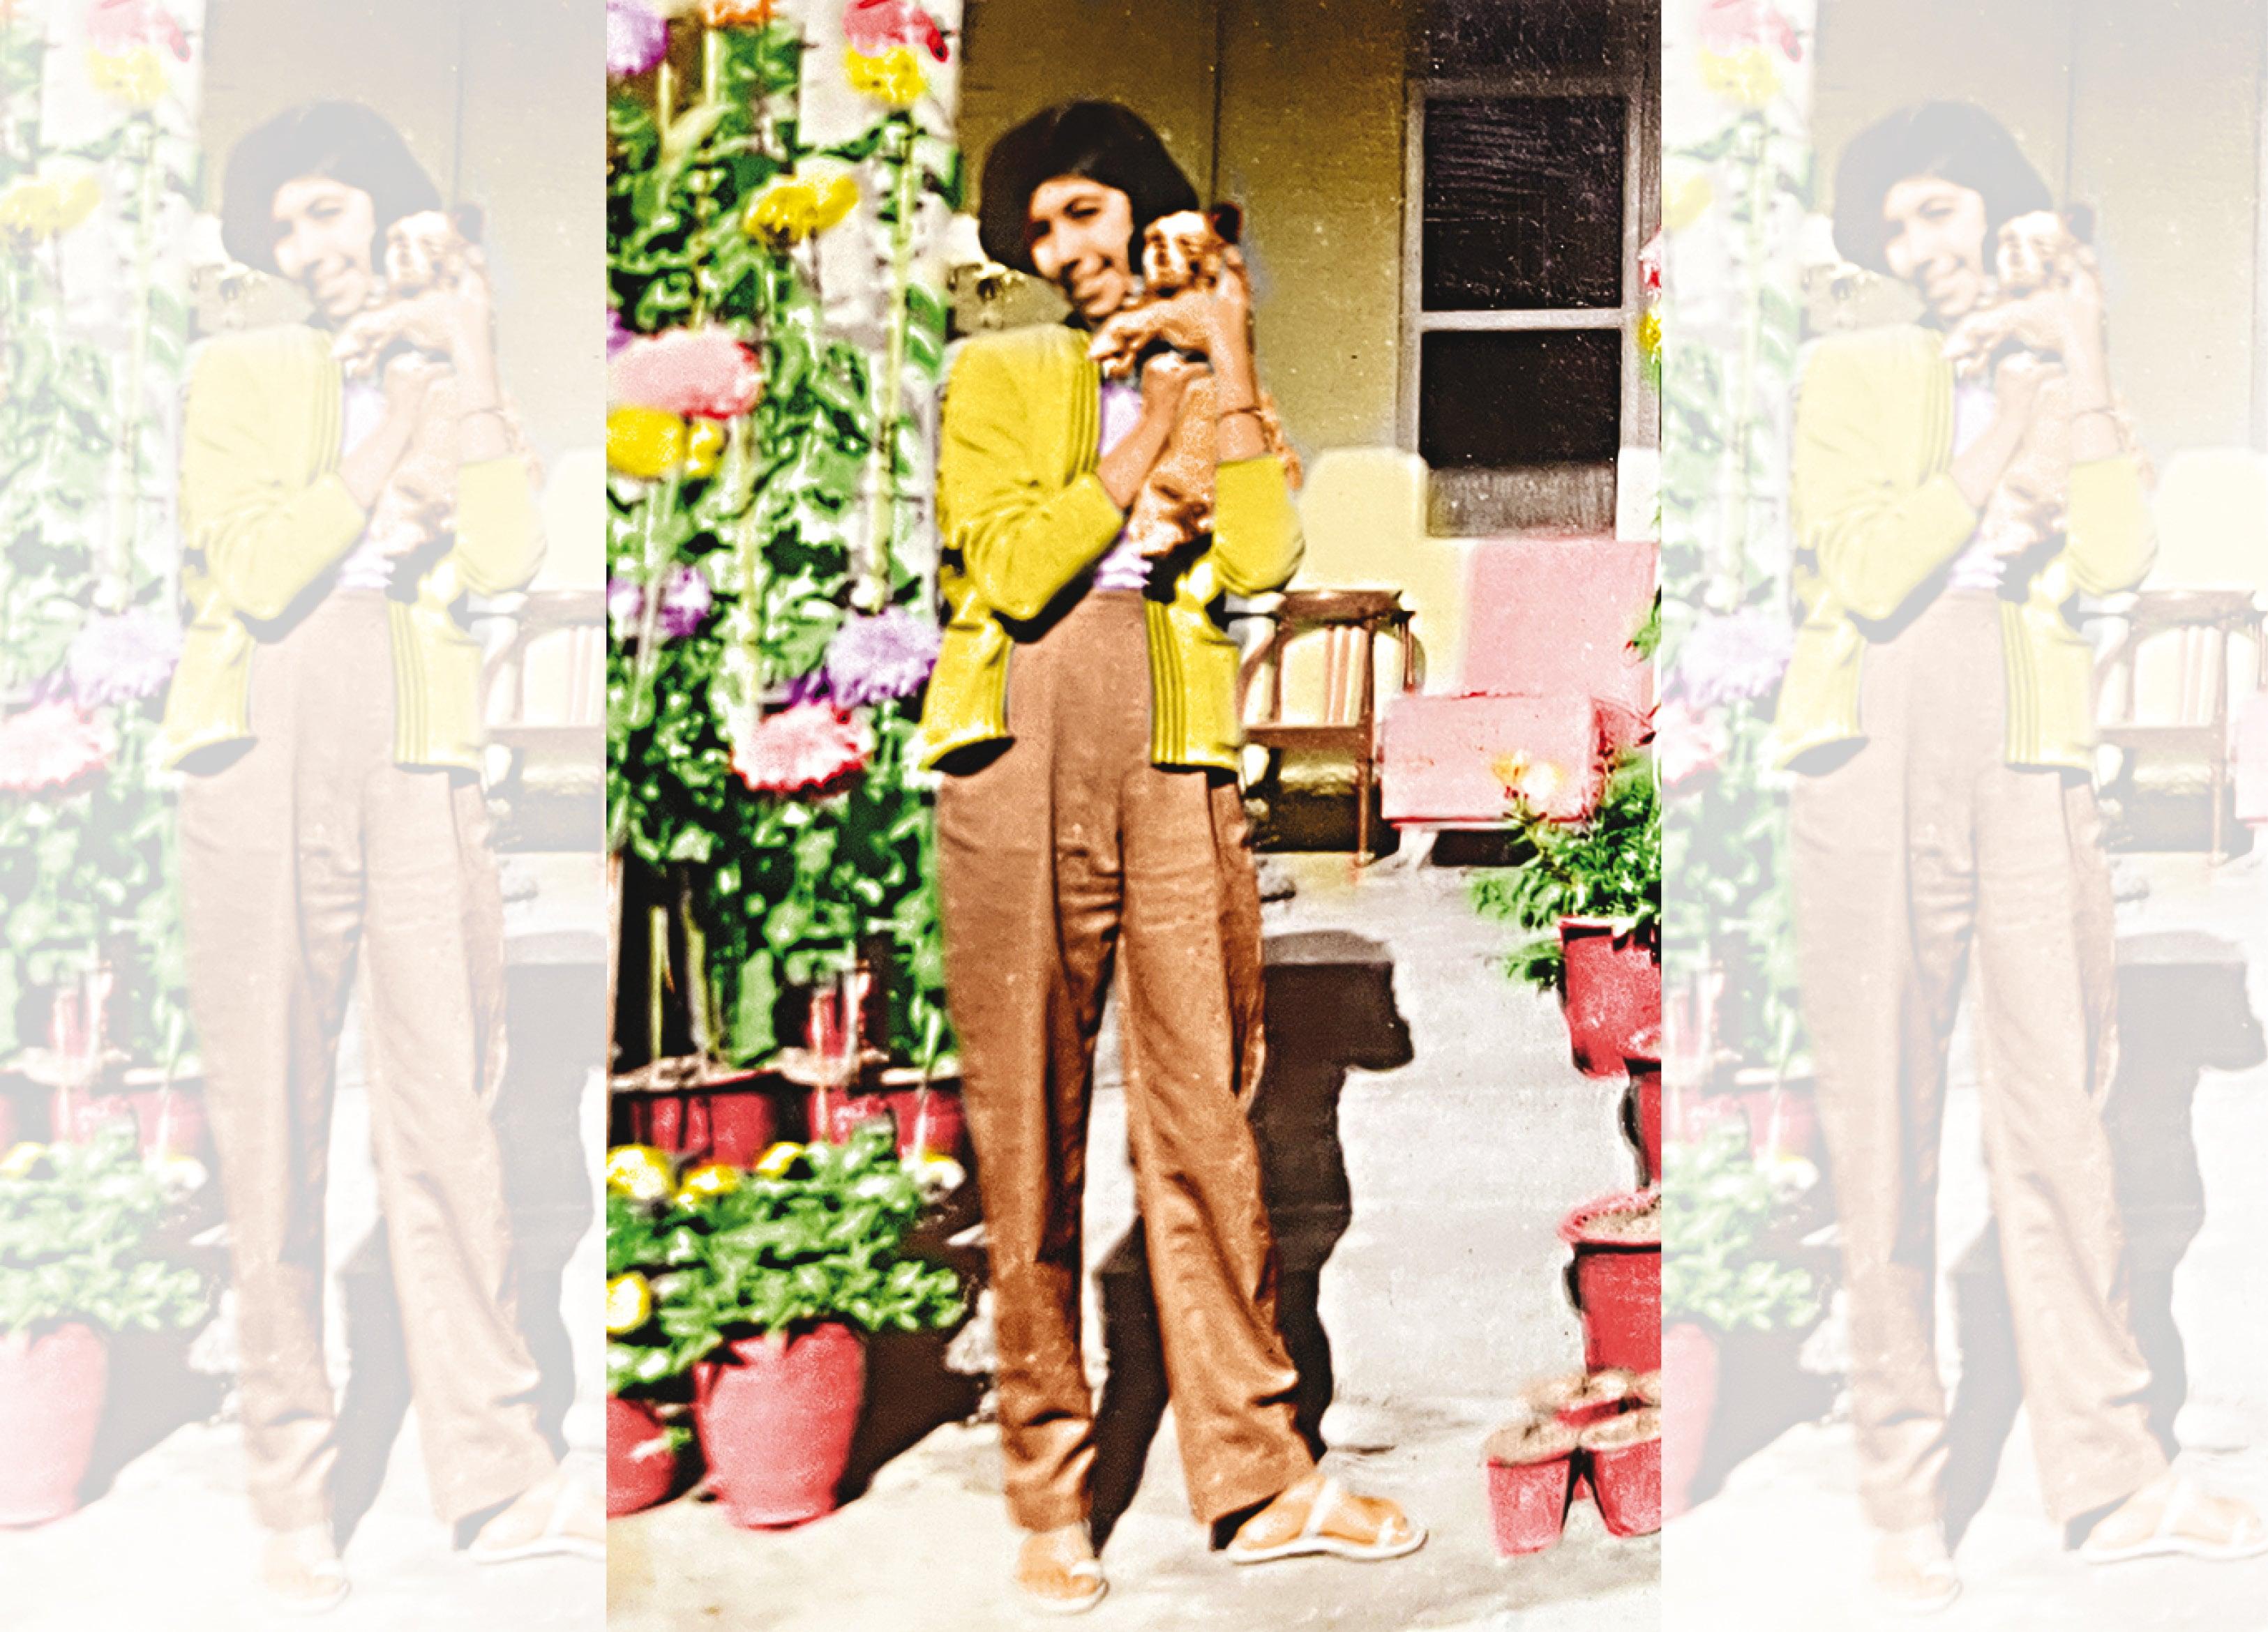 Ritu with her dog Simmi